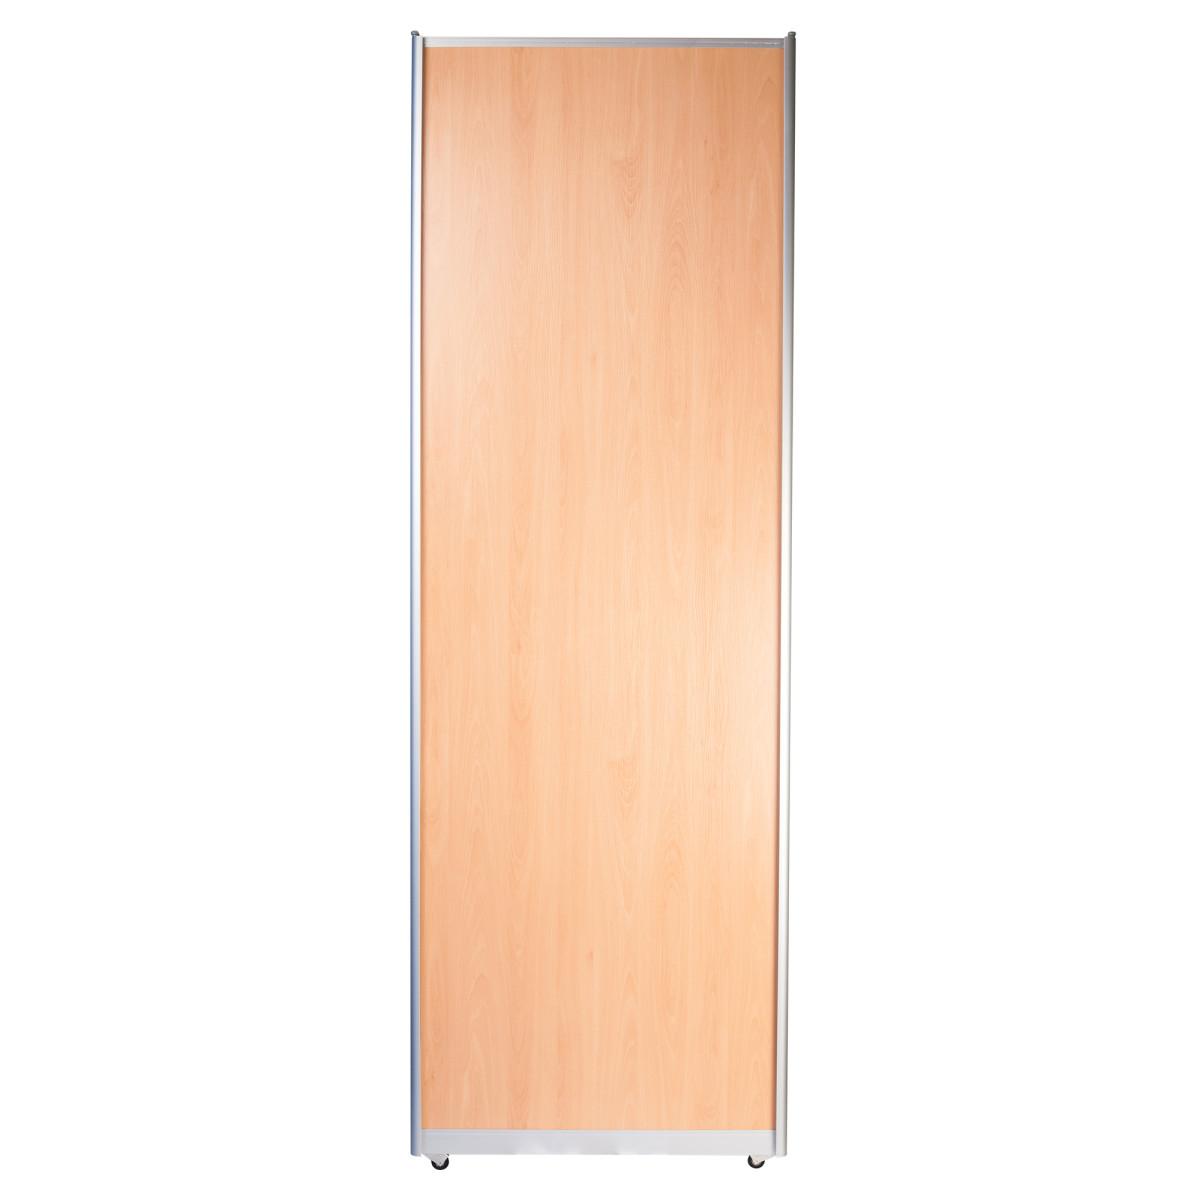 Дверь-купе 2460х842 мм цвет бук/серебро